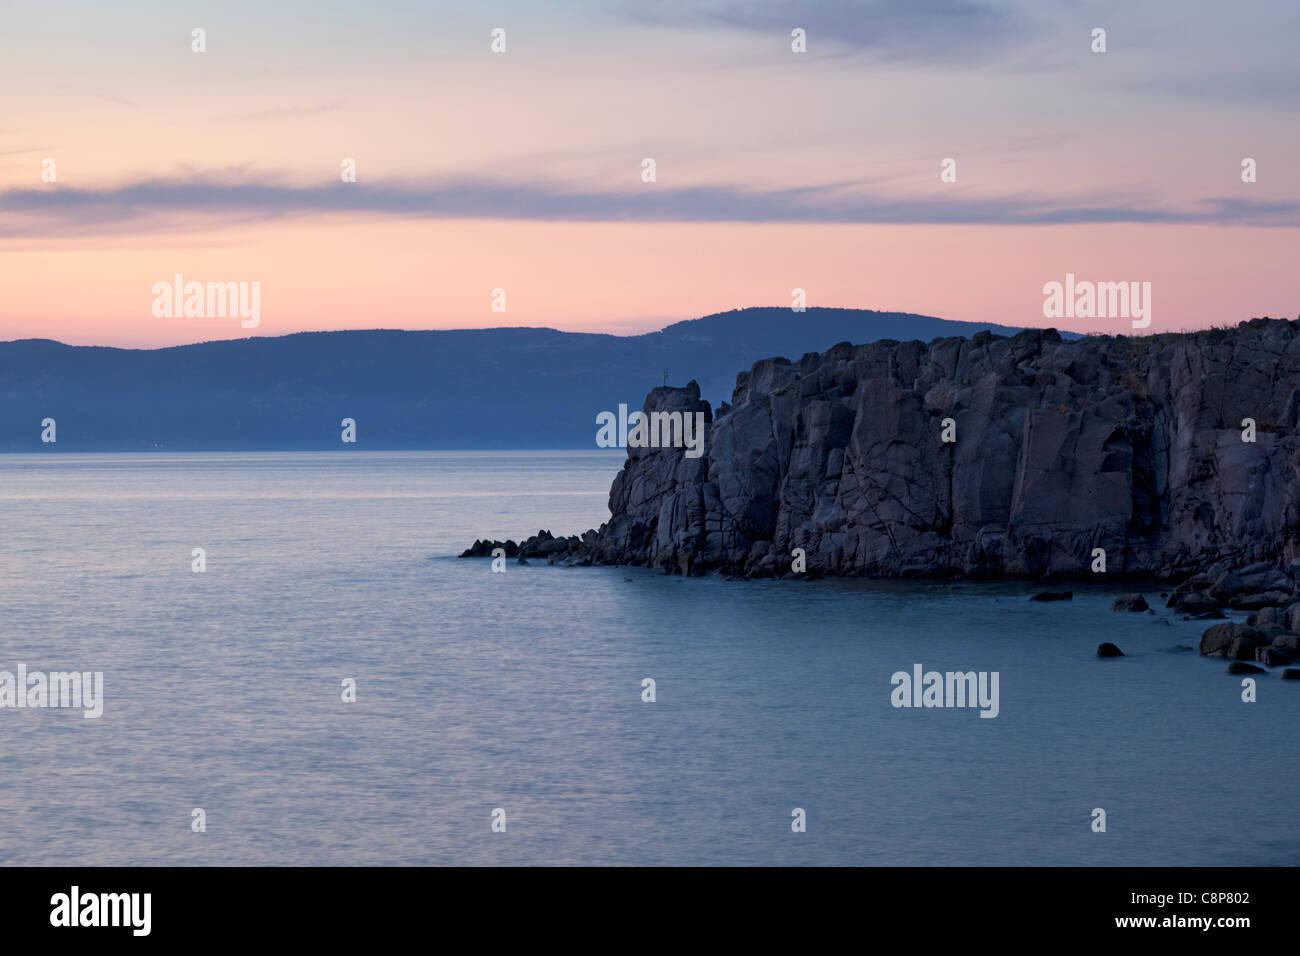 Coast of Lesbos, Greece, at sundown - Stock Image